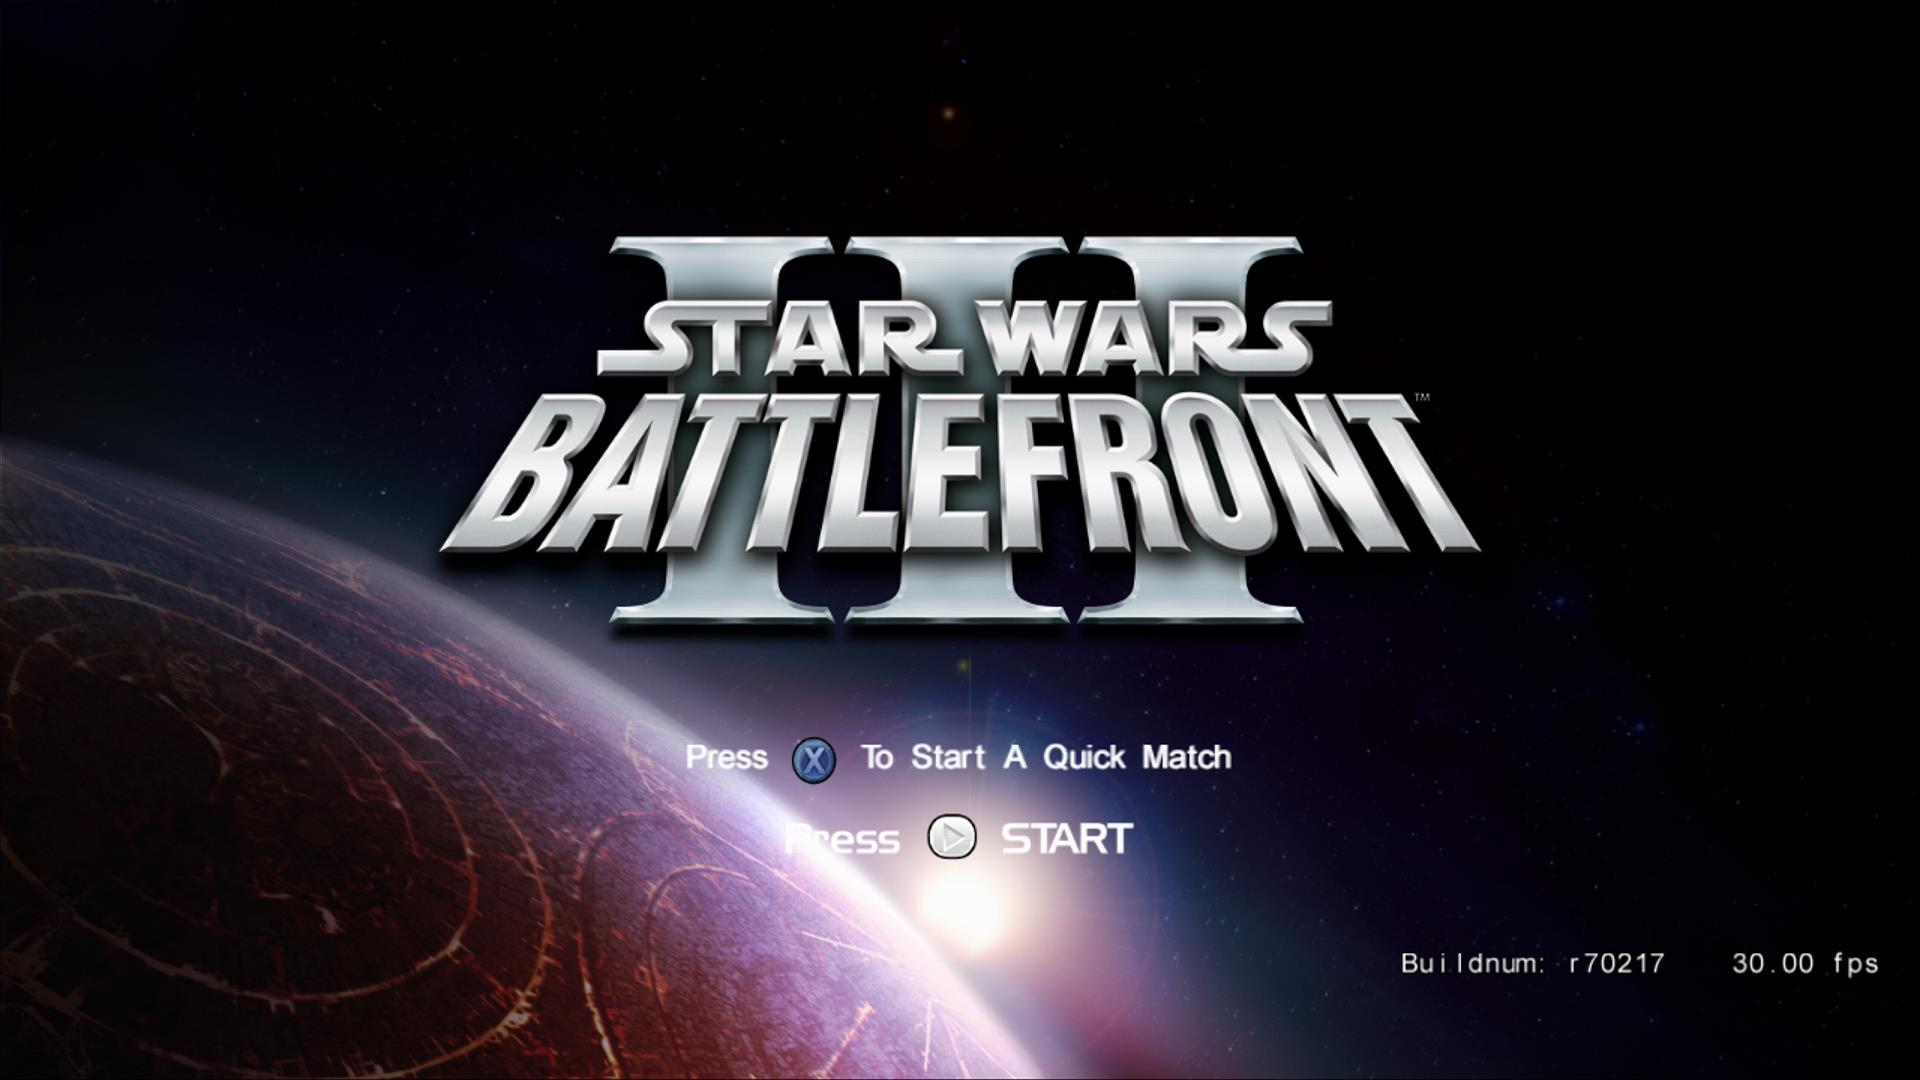 Star Wars Battlefront  Free Radical Pc Build